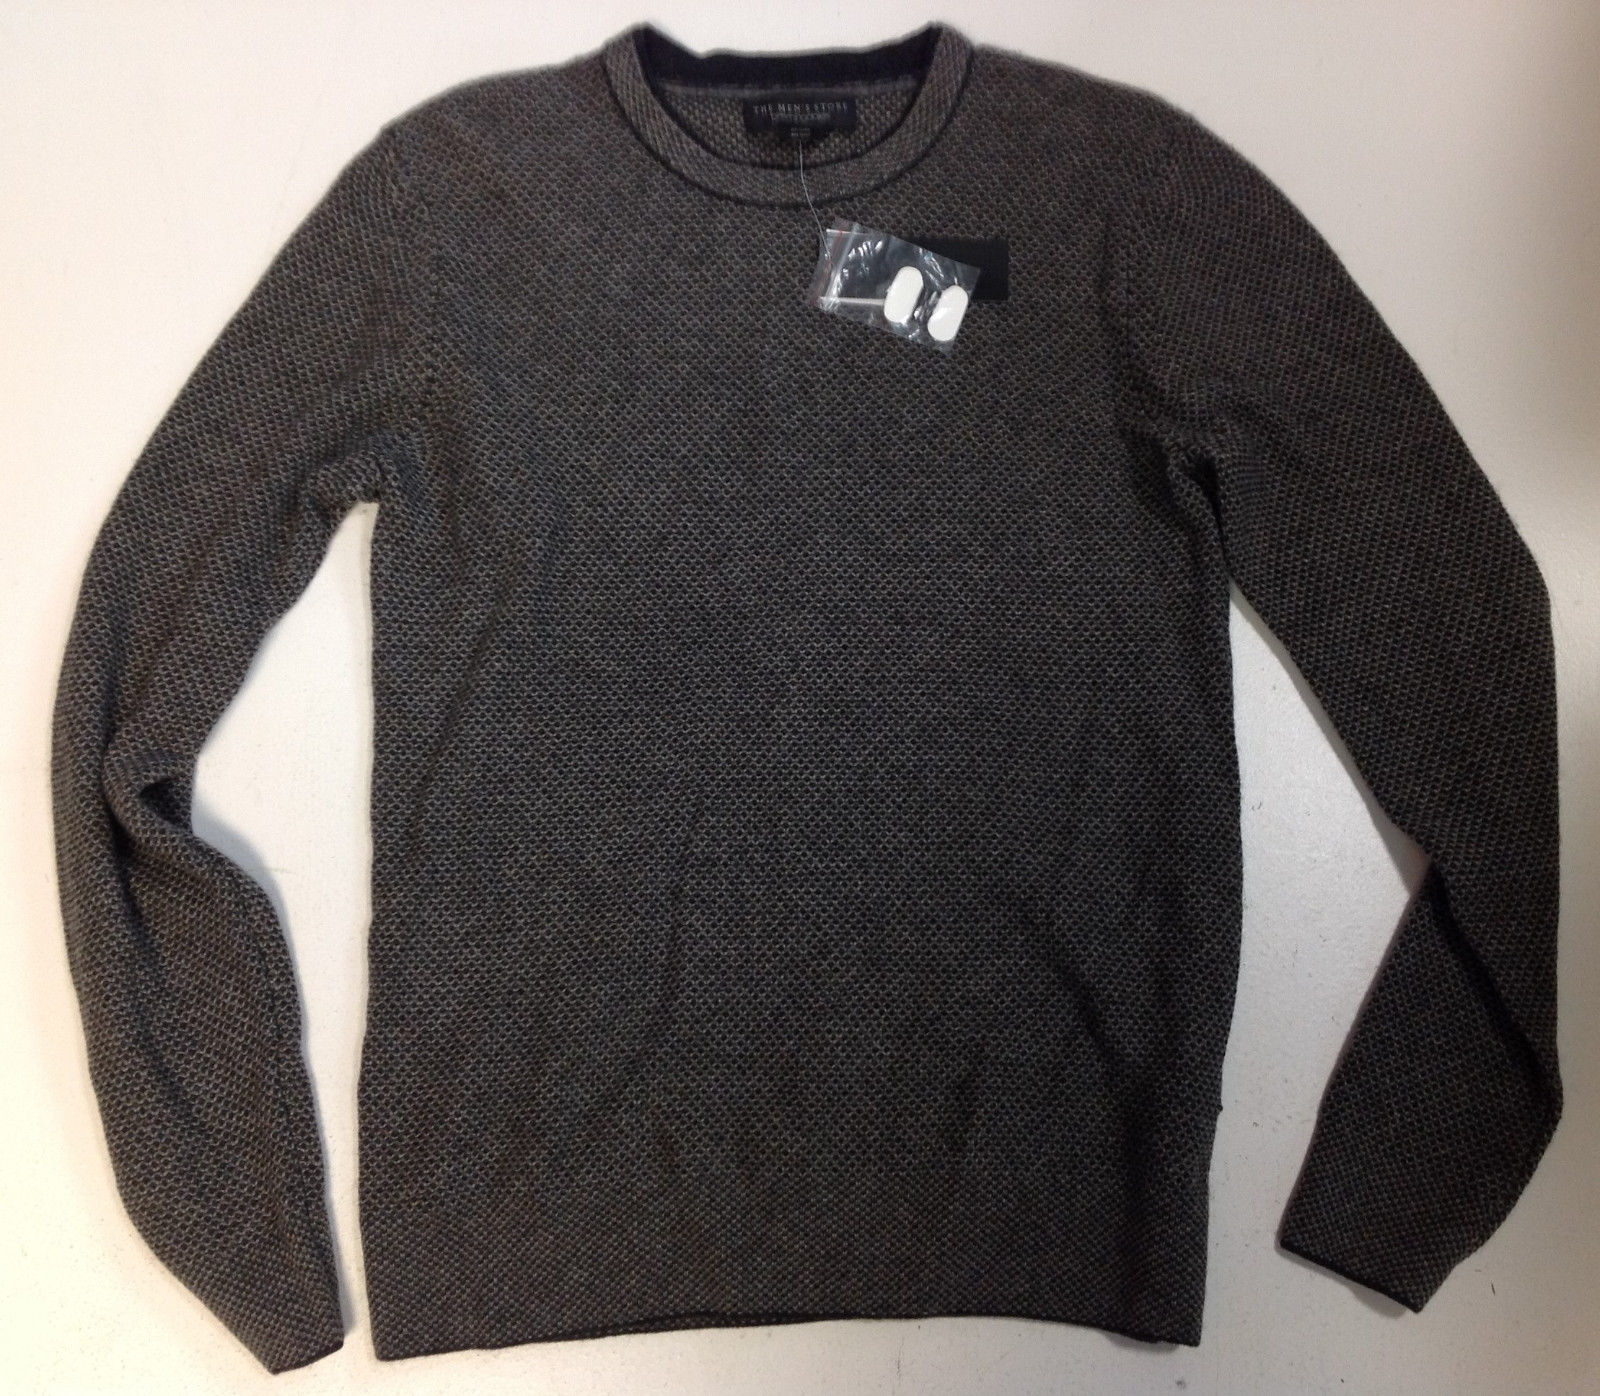 Bloomingdale's The Men's Store Wool Cashmere Birdseye Jacquard Sweater, S, $148